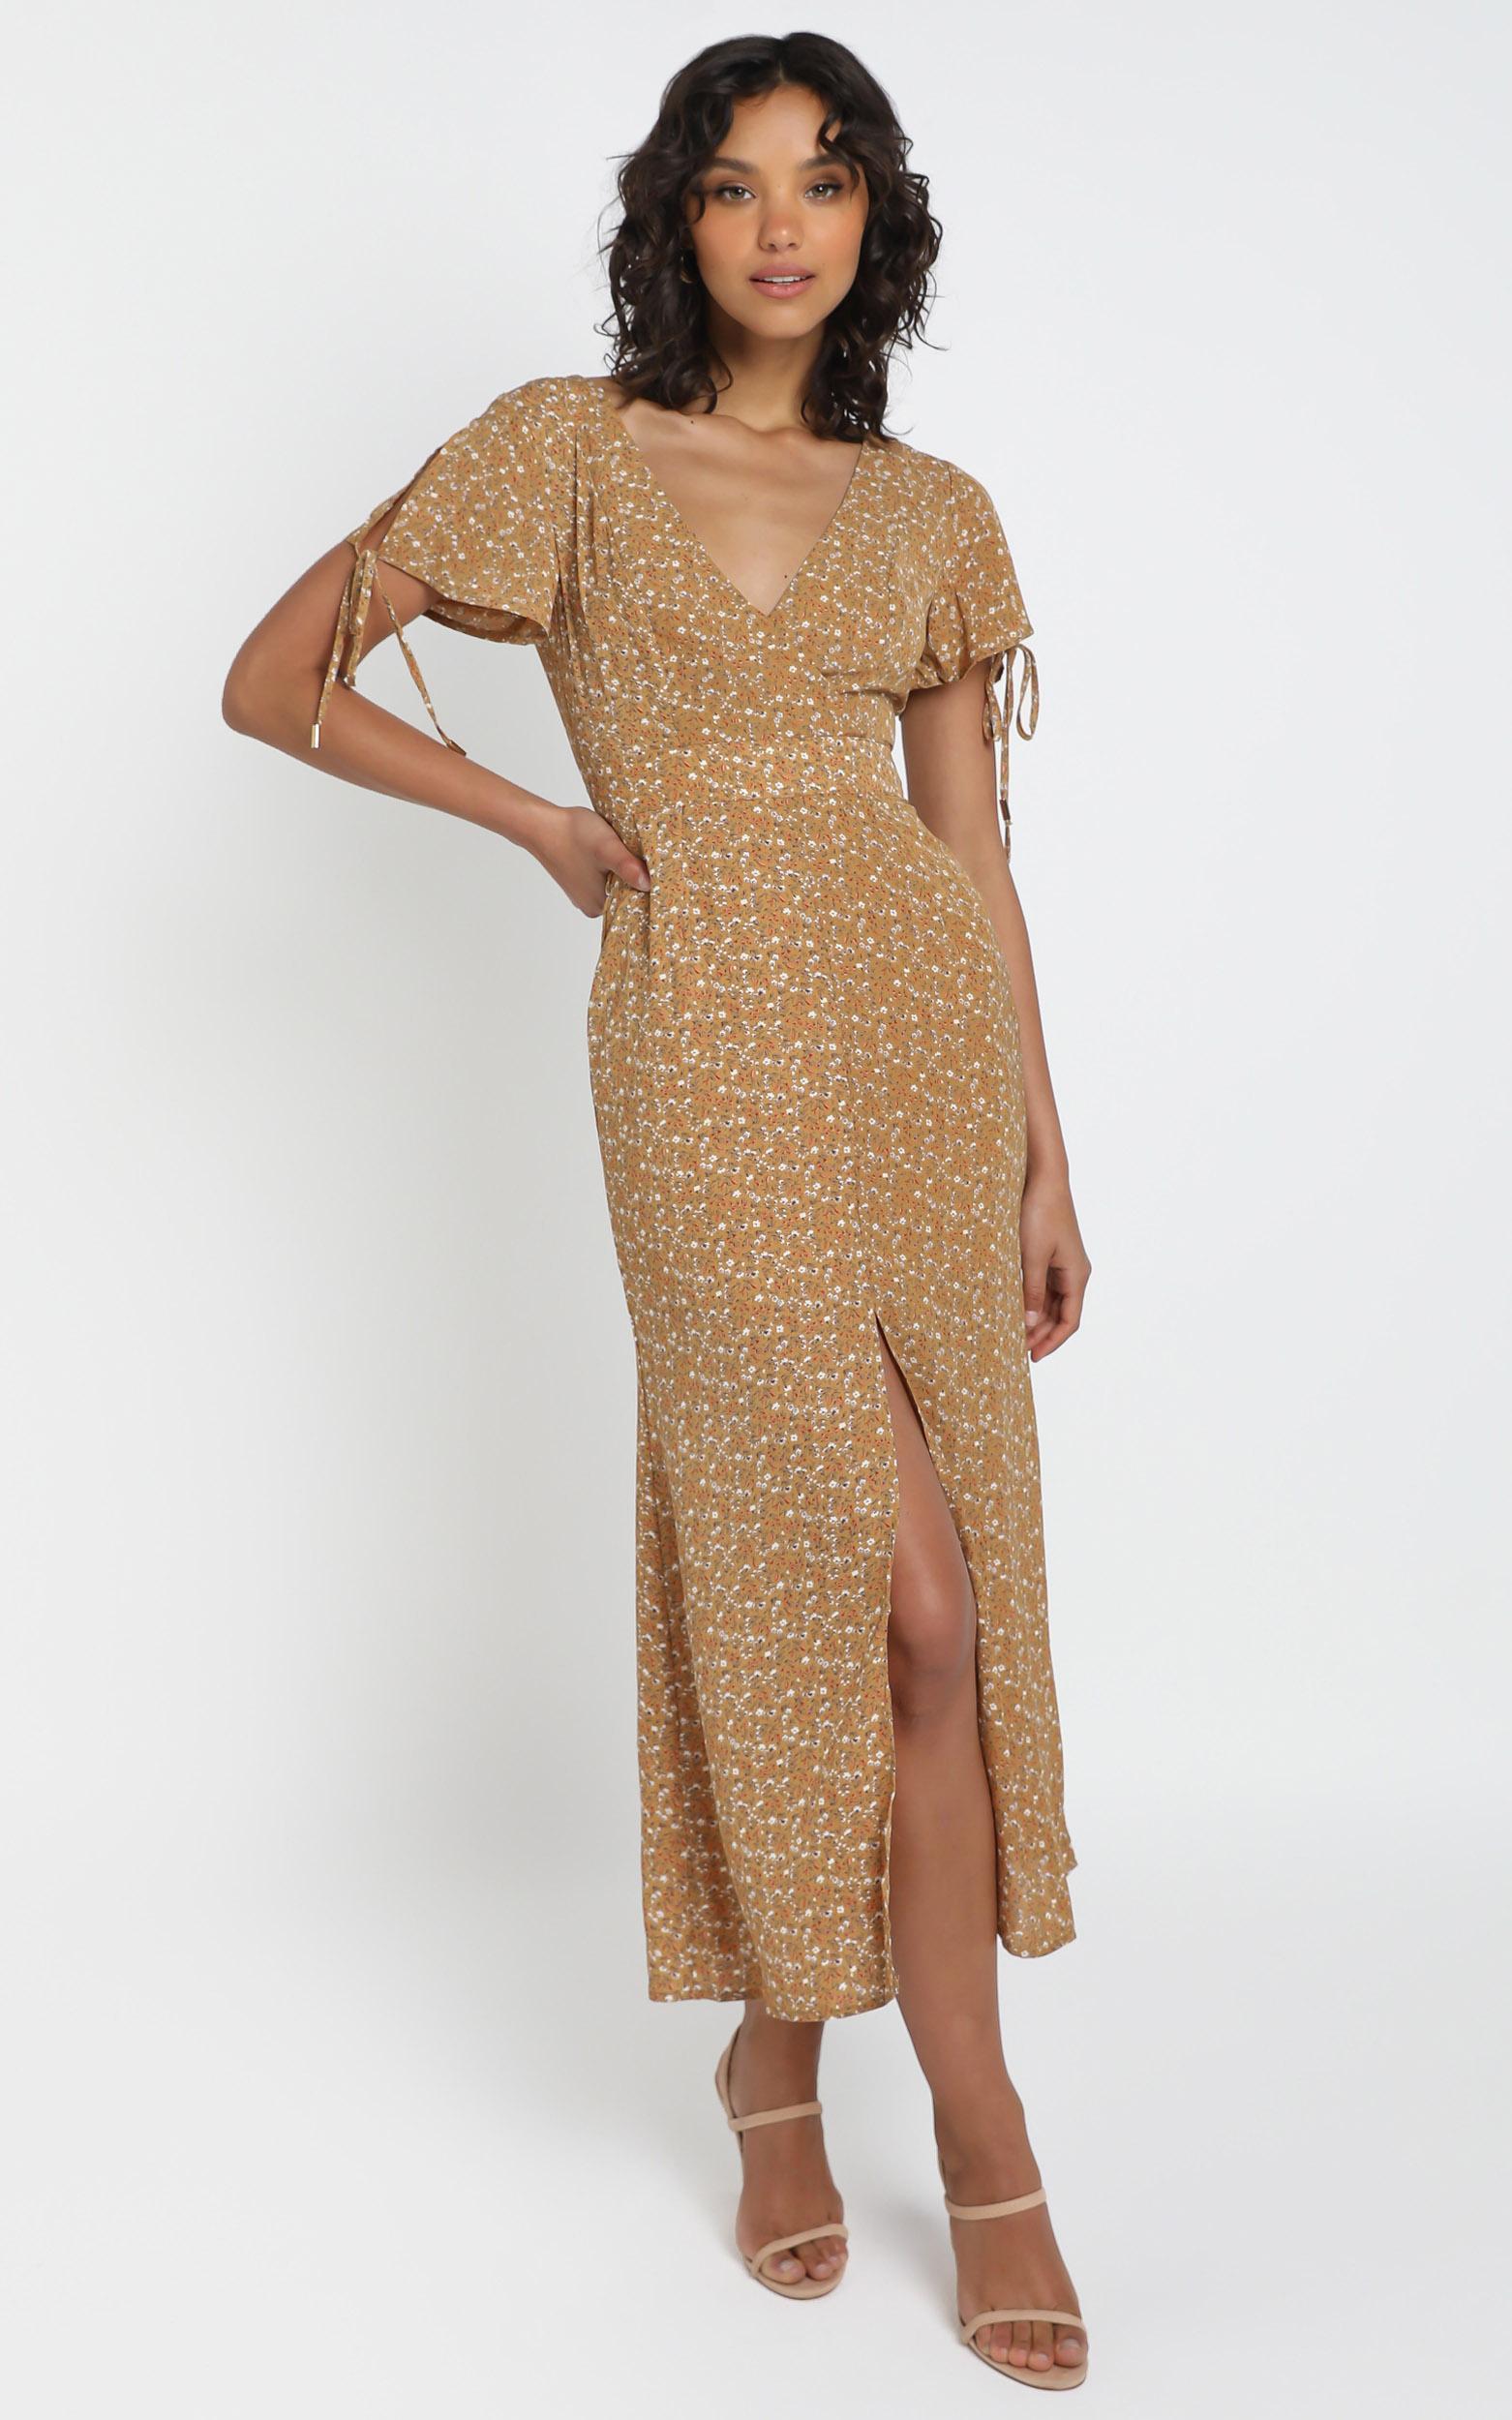 Amara Midi Dress in Mustard Floral - 12 (L), Mustard, hi-res image number null